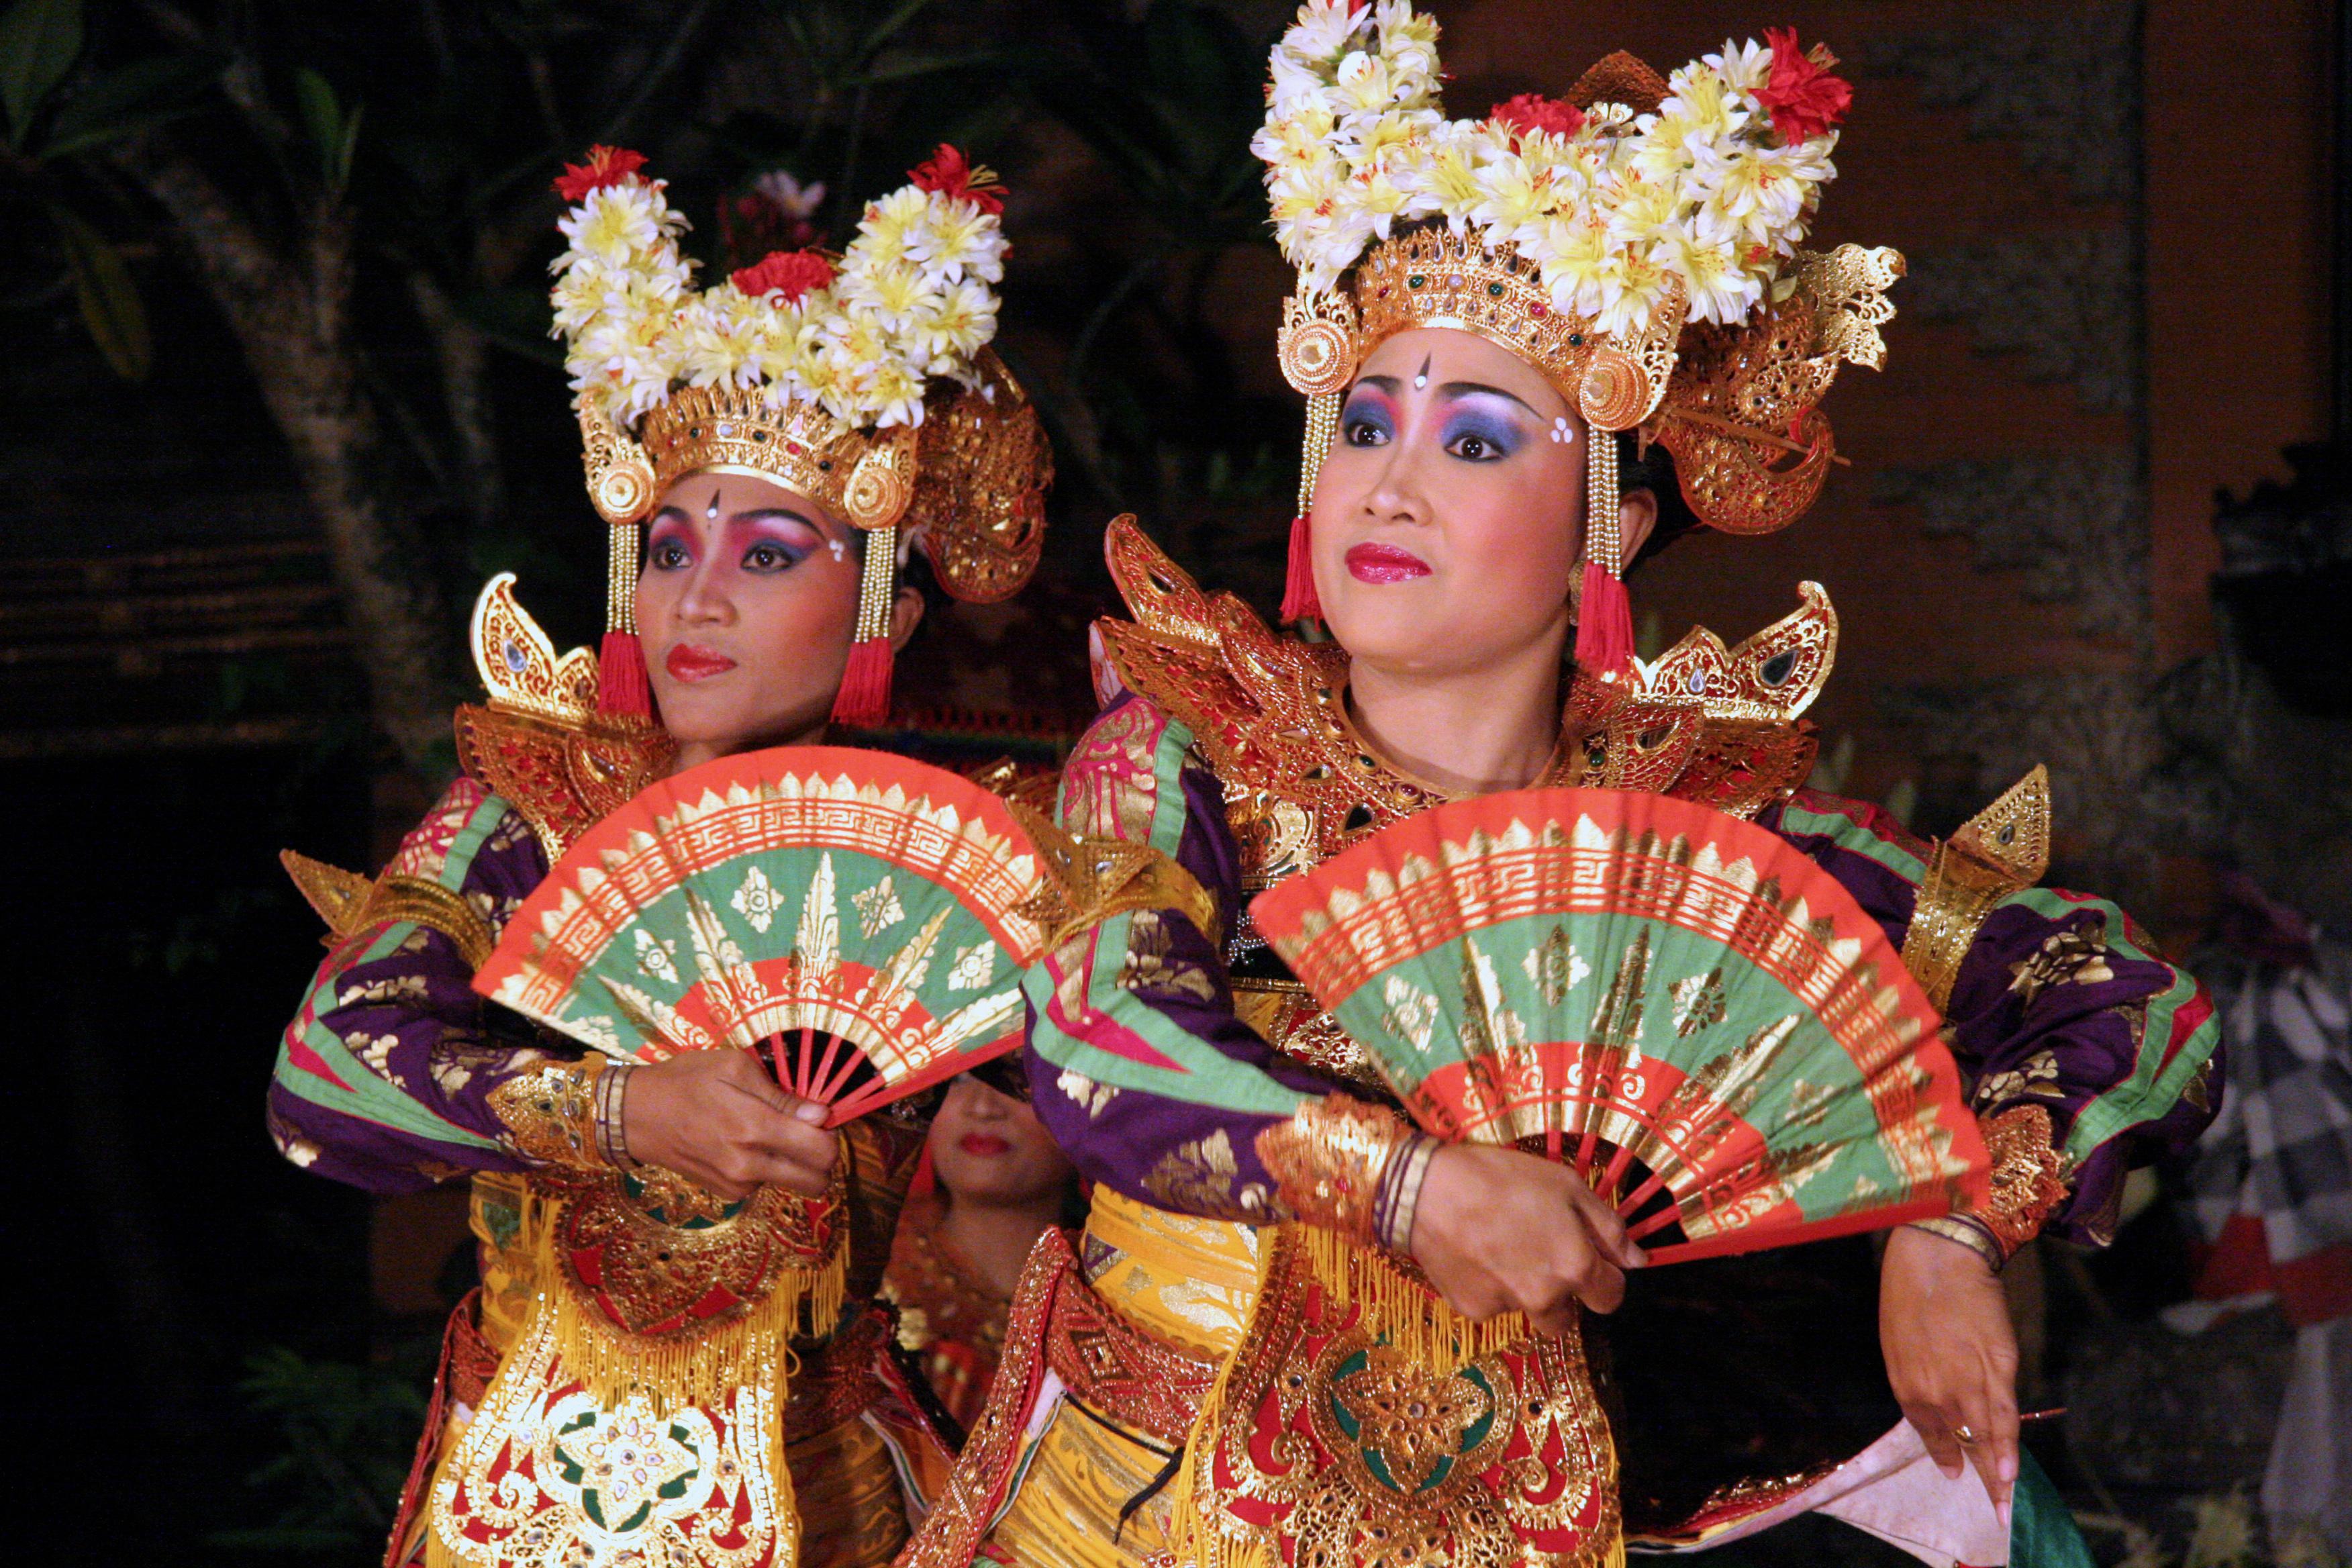 Description Bali-Danse 0704a.jpg